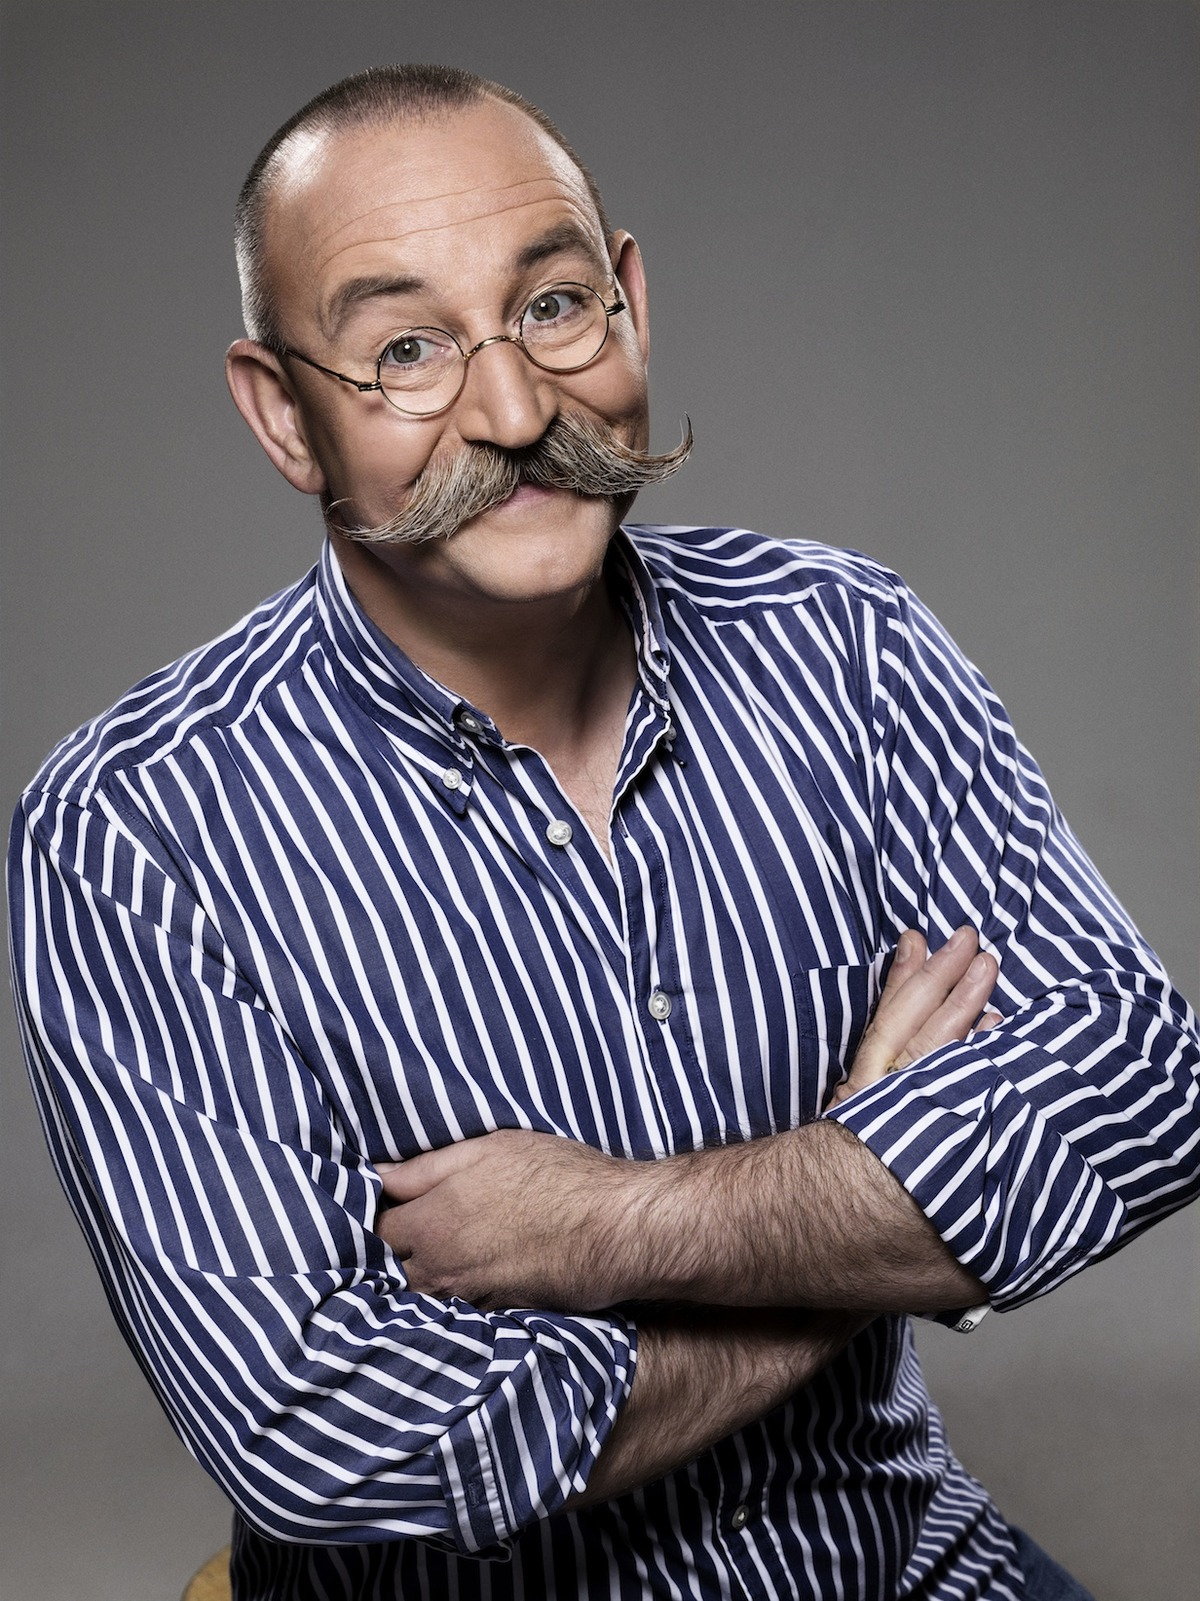 Horst Lichter Körpergröße